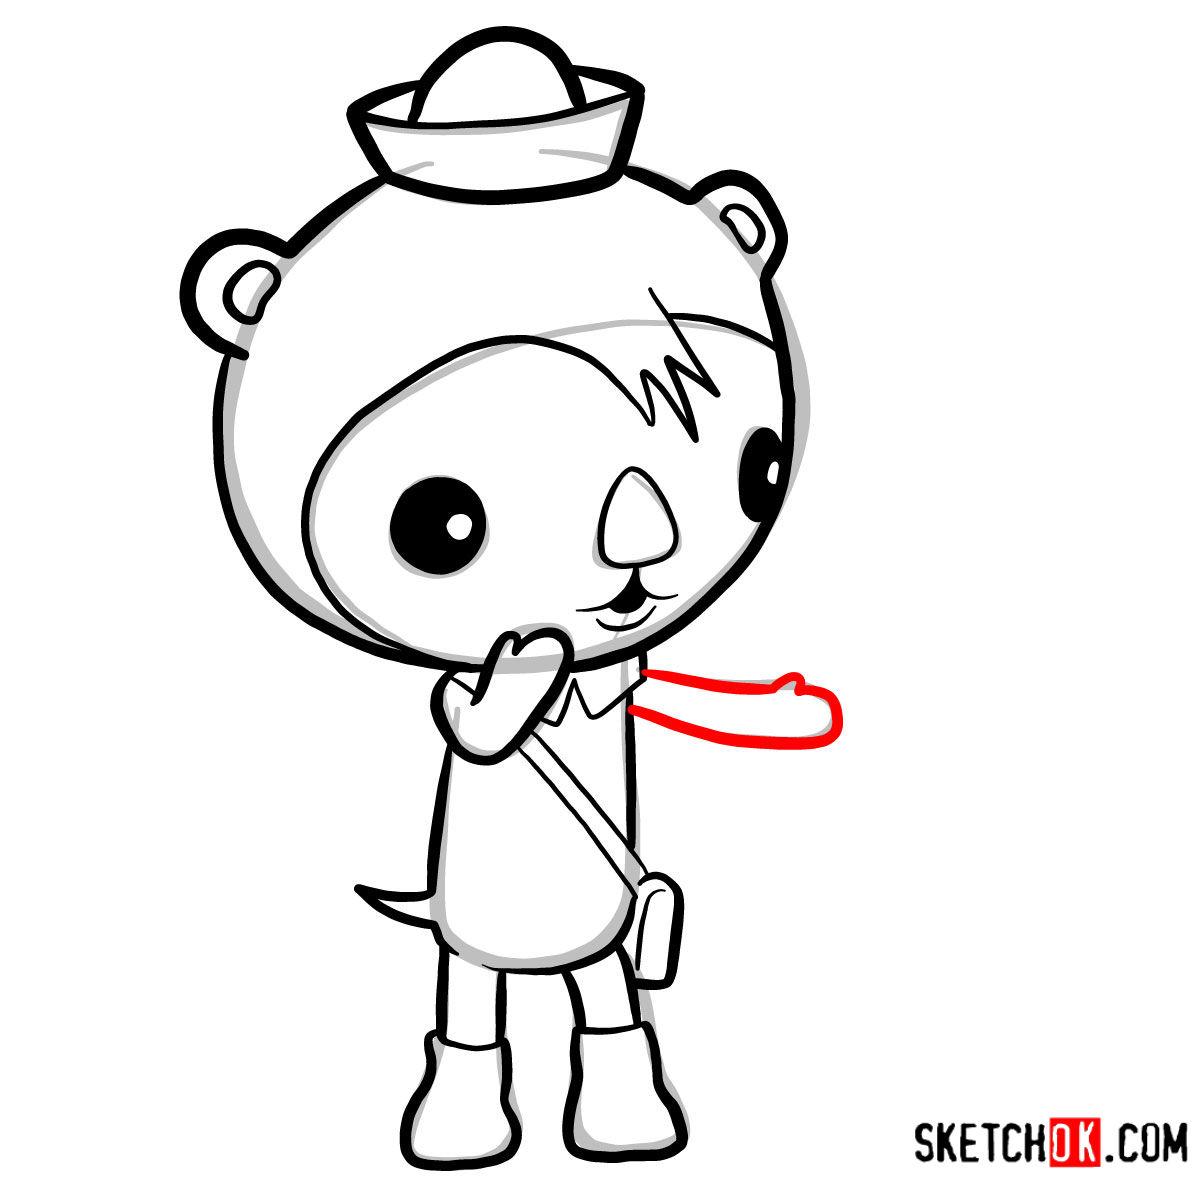 How to draw Shellington Sea Otter | Octonauts - step 07